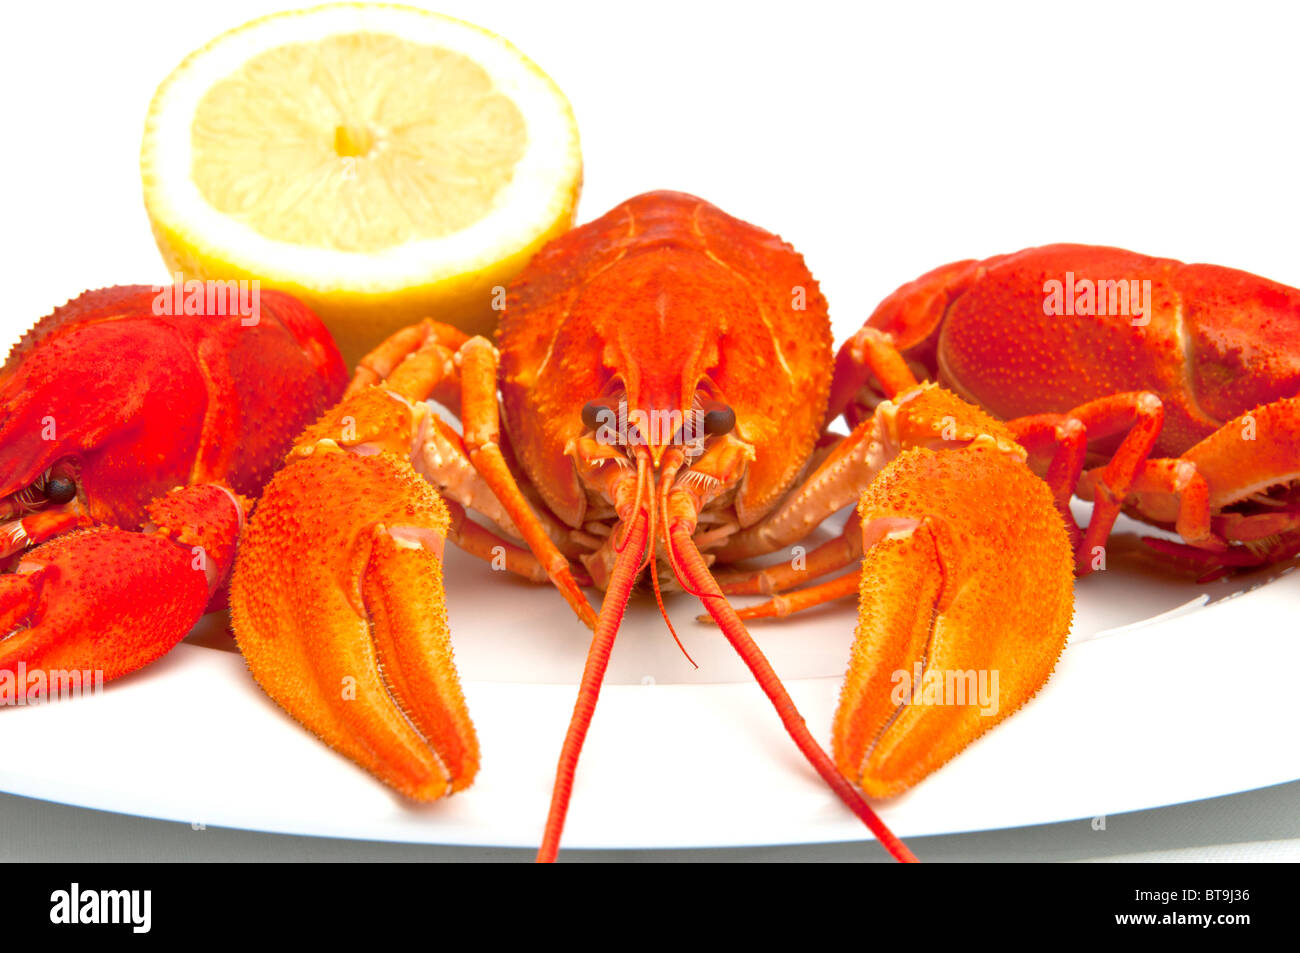 Freshwater crayfish; Flusskrebs - Stock Image